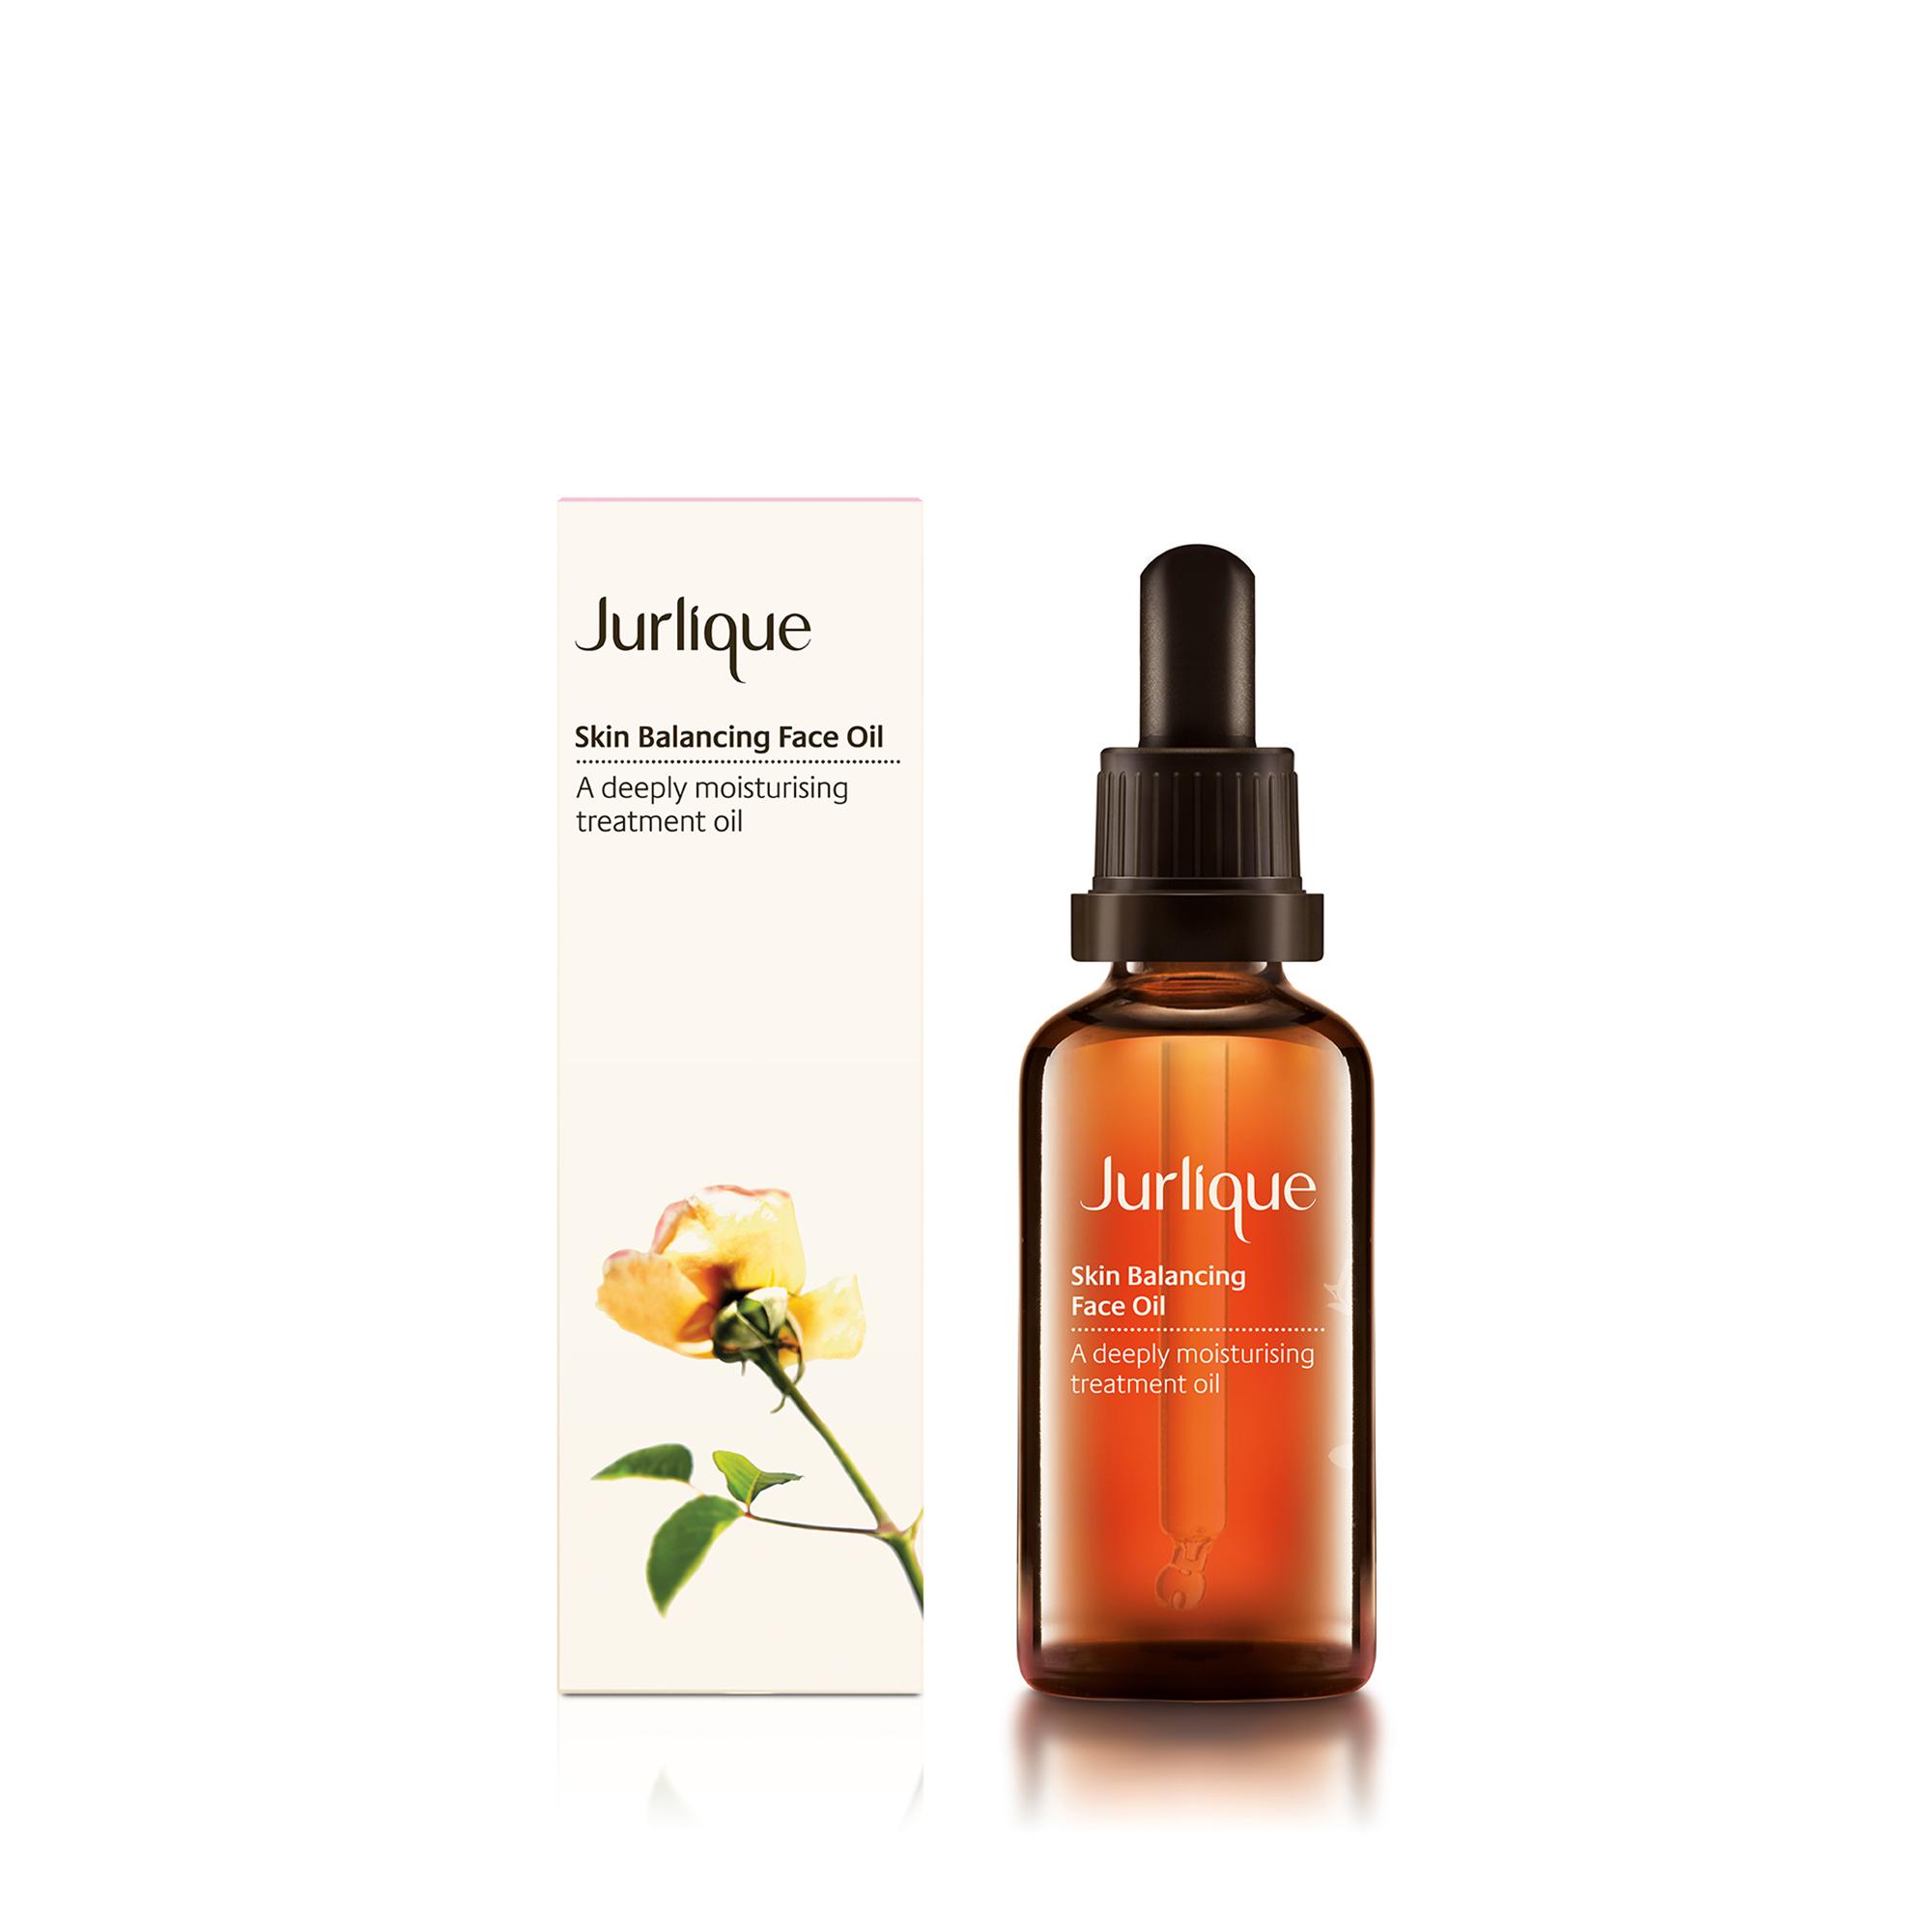 Jurlique Skin Balancing Face Oil, 50 ml